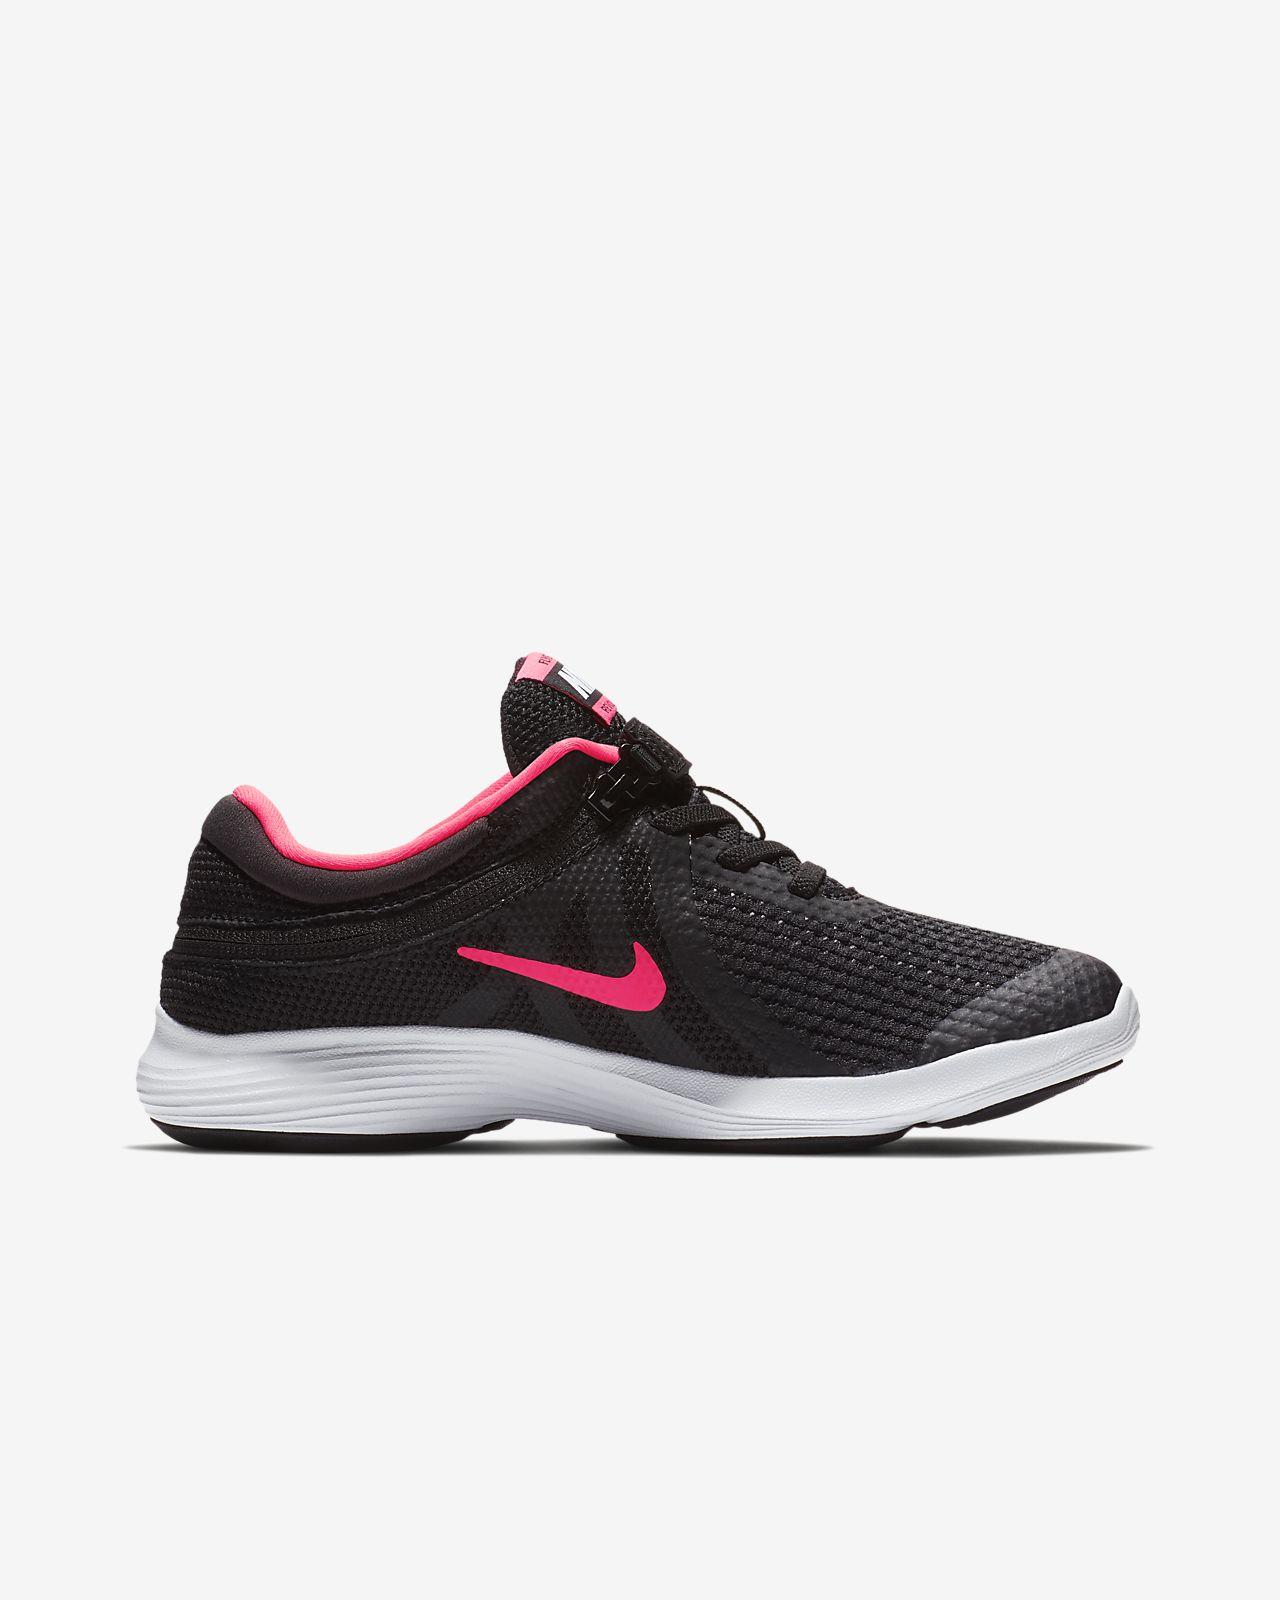 huge discount 640fc 2334a ... Nike Revolution 4 FlyEase Big Kids  Running Shoe